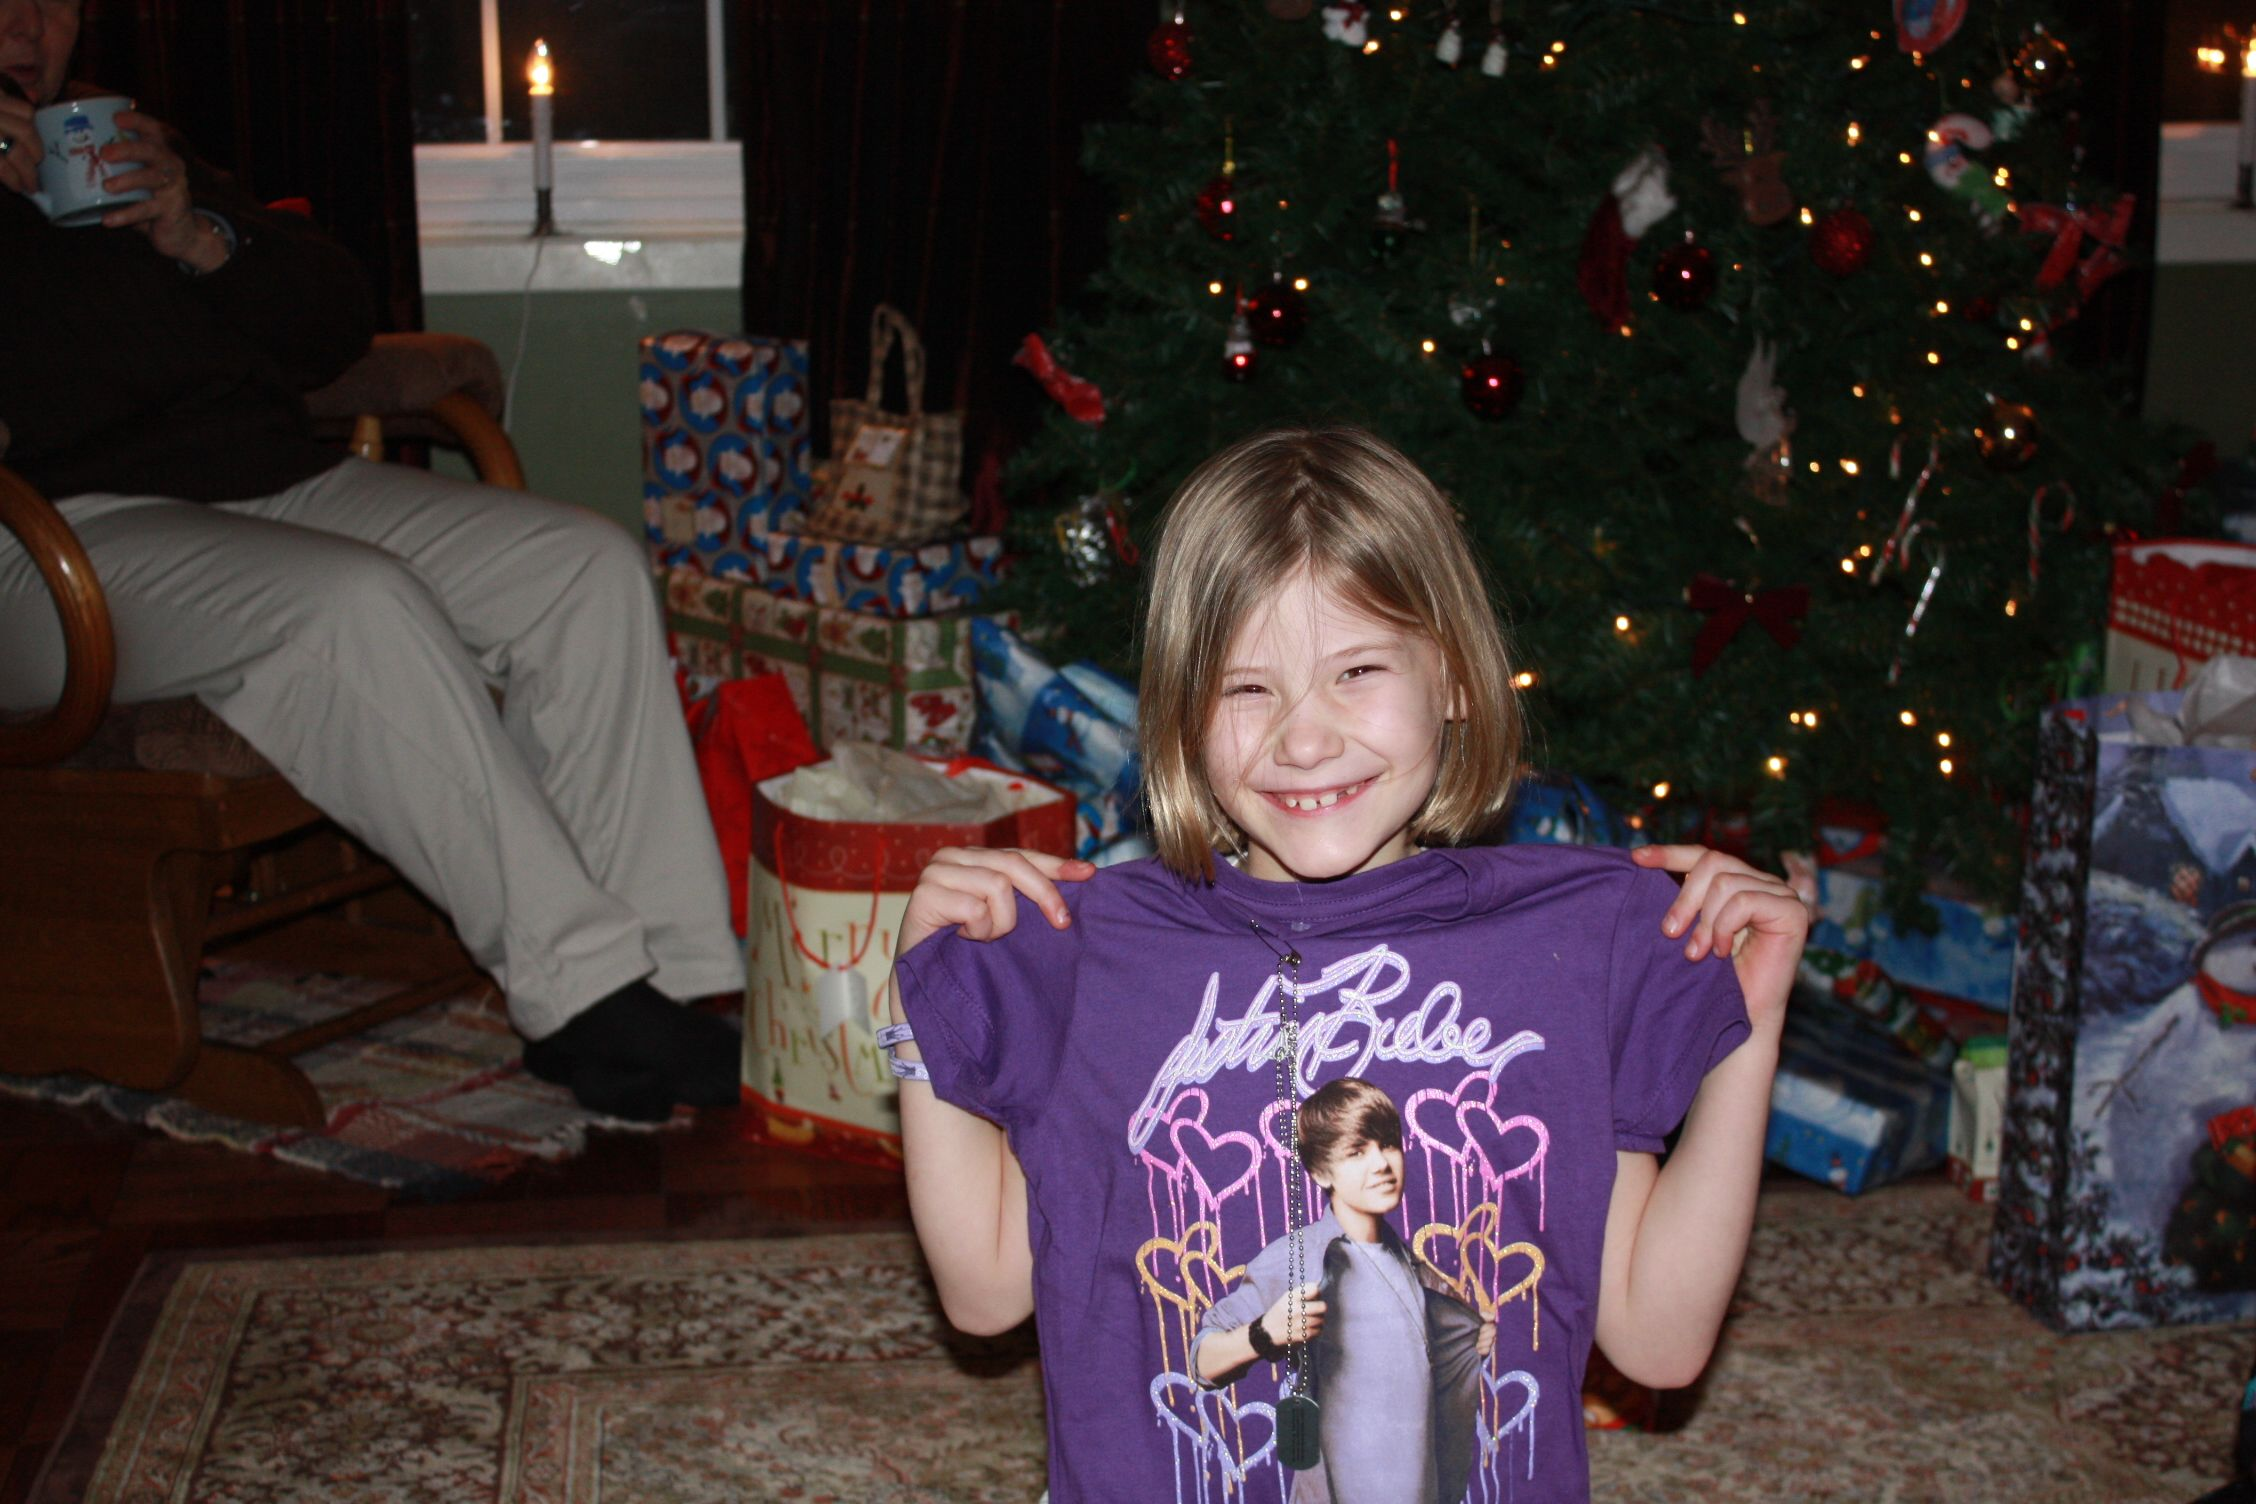 Christmas am Sophie